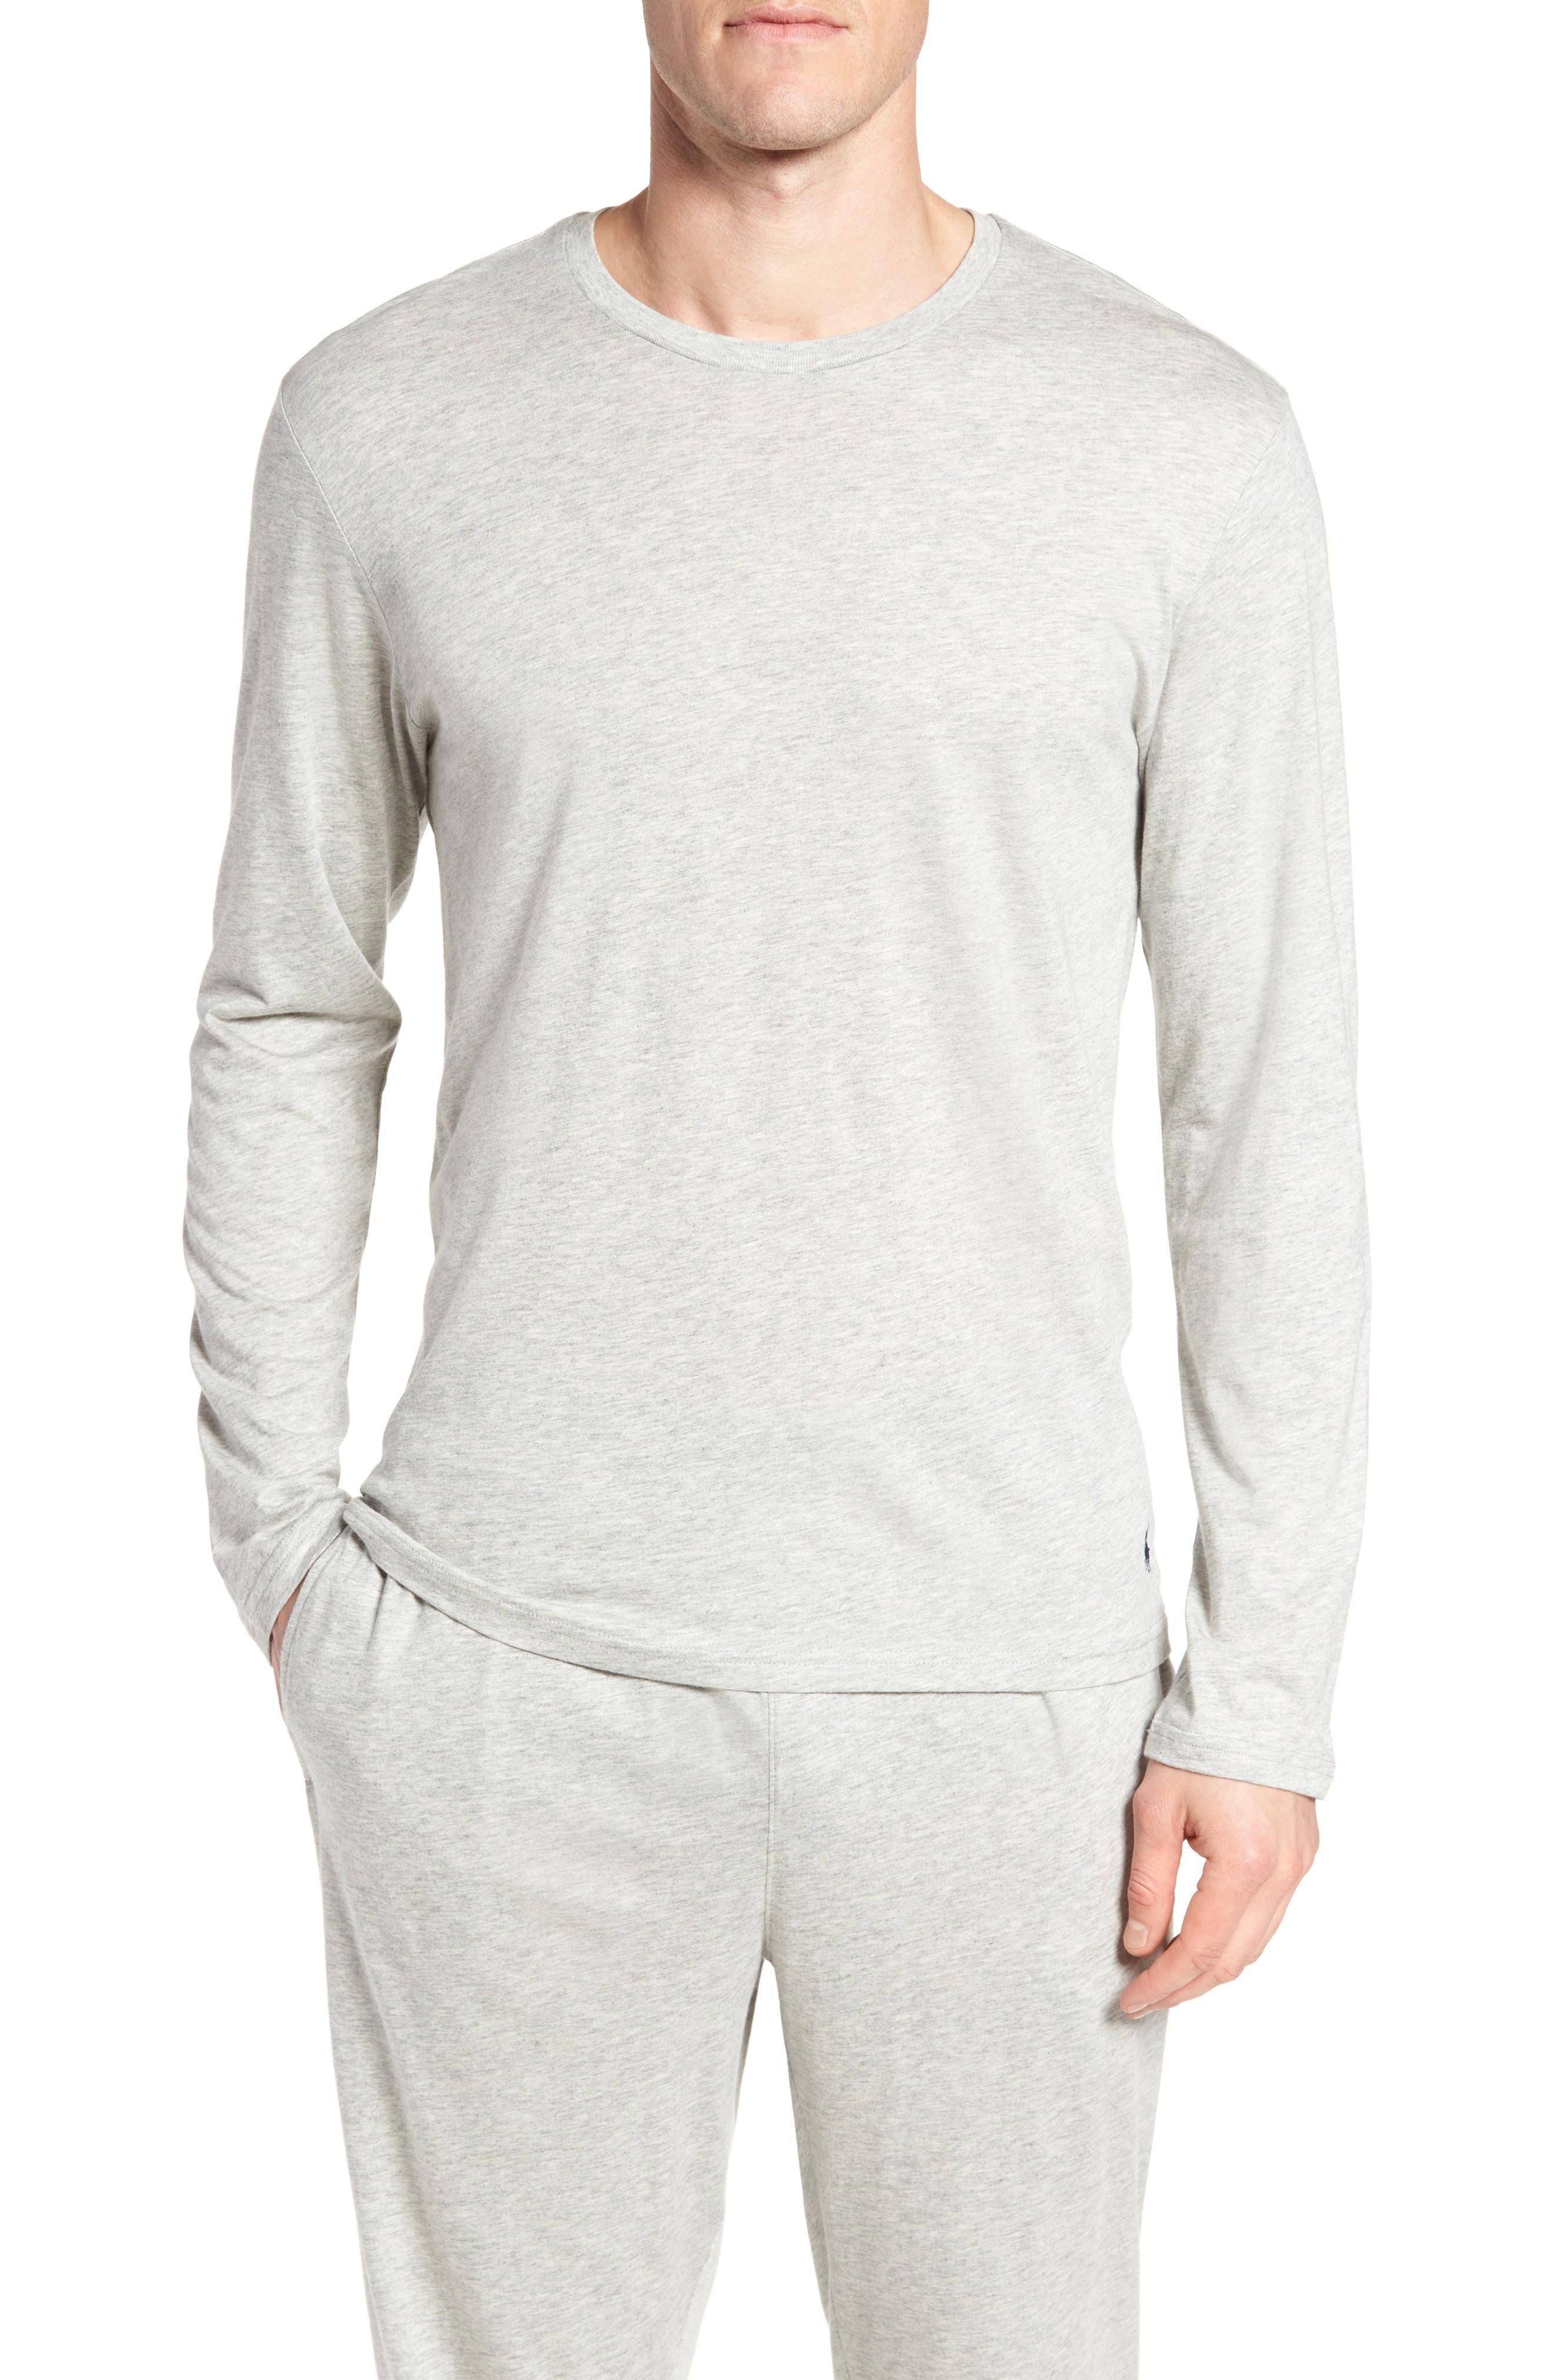 Supreme Comfort Cotton & Modal T-Shirt,                             Main thumbnail 1, color,                             024